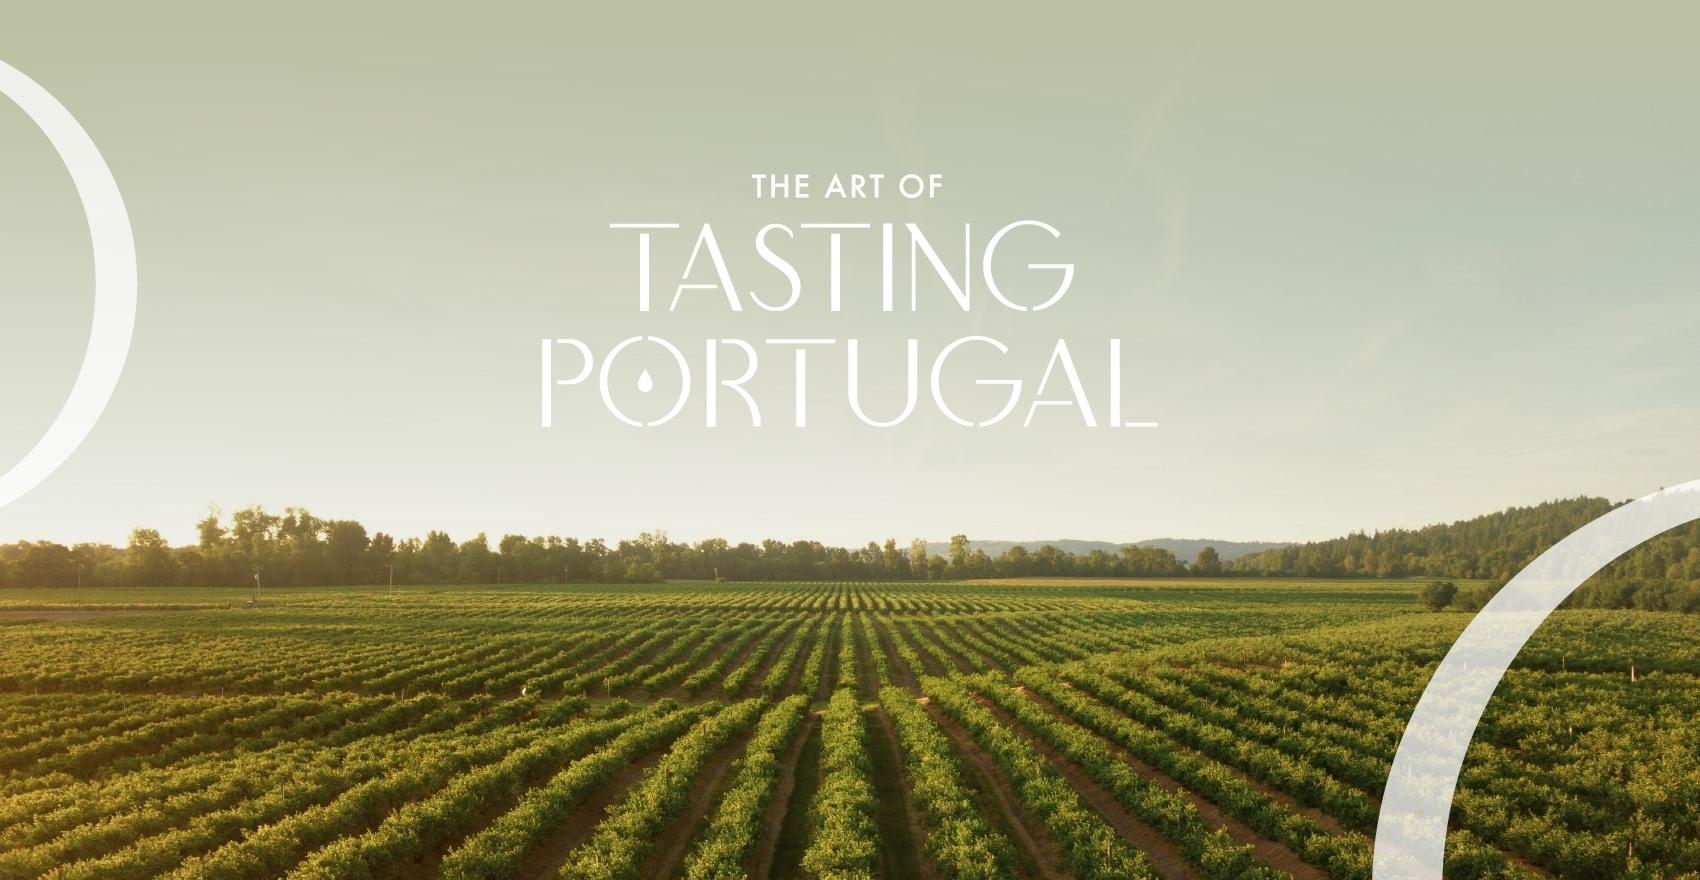 The Art of Tasting Portugal